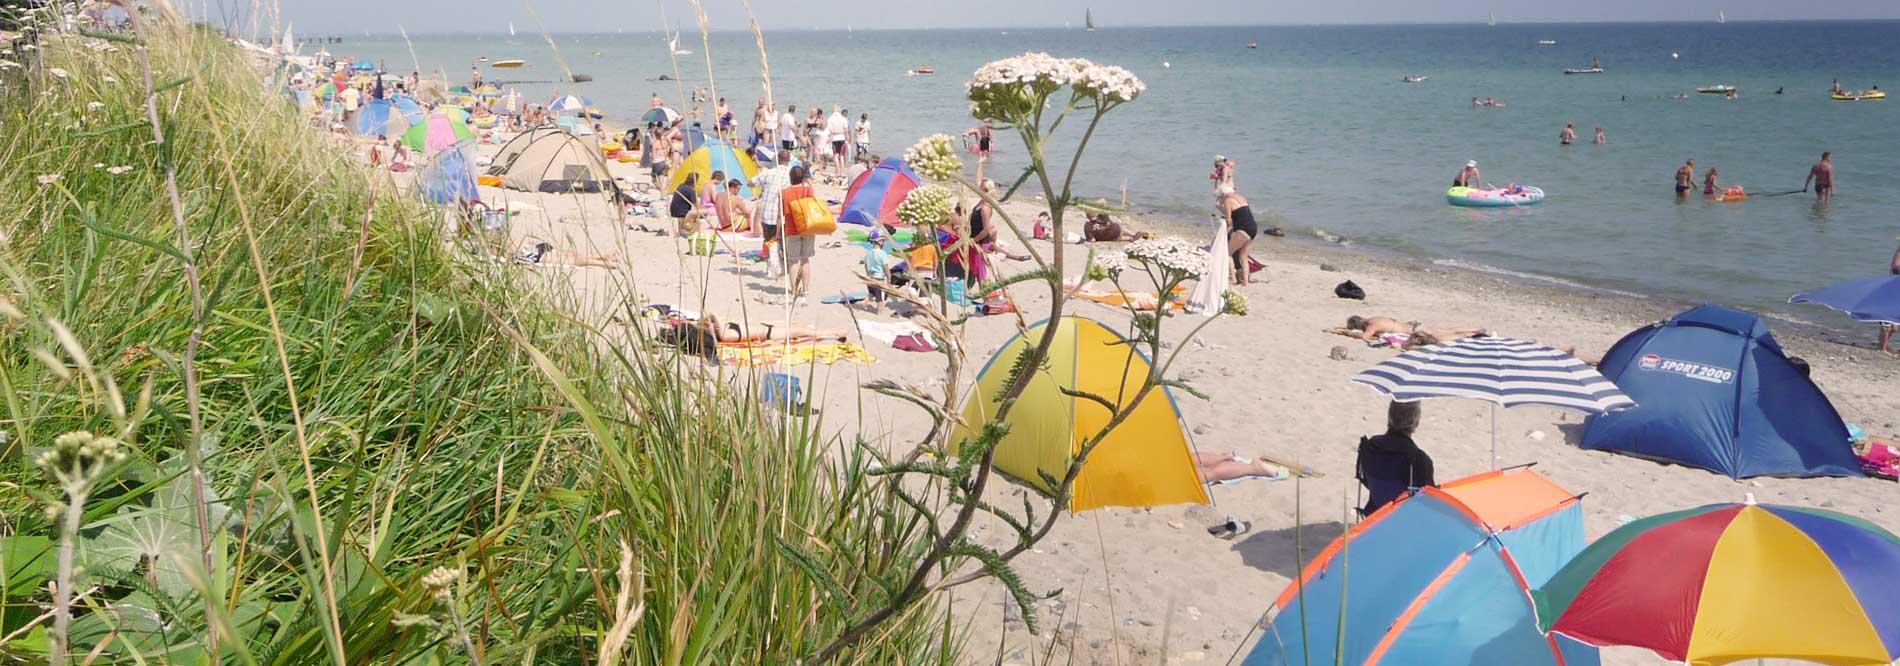 Strand fkk jugend Fotobuch Akt